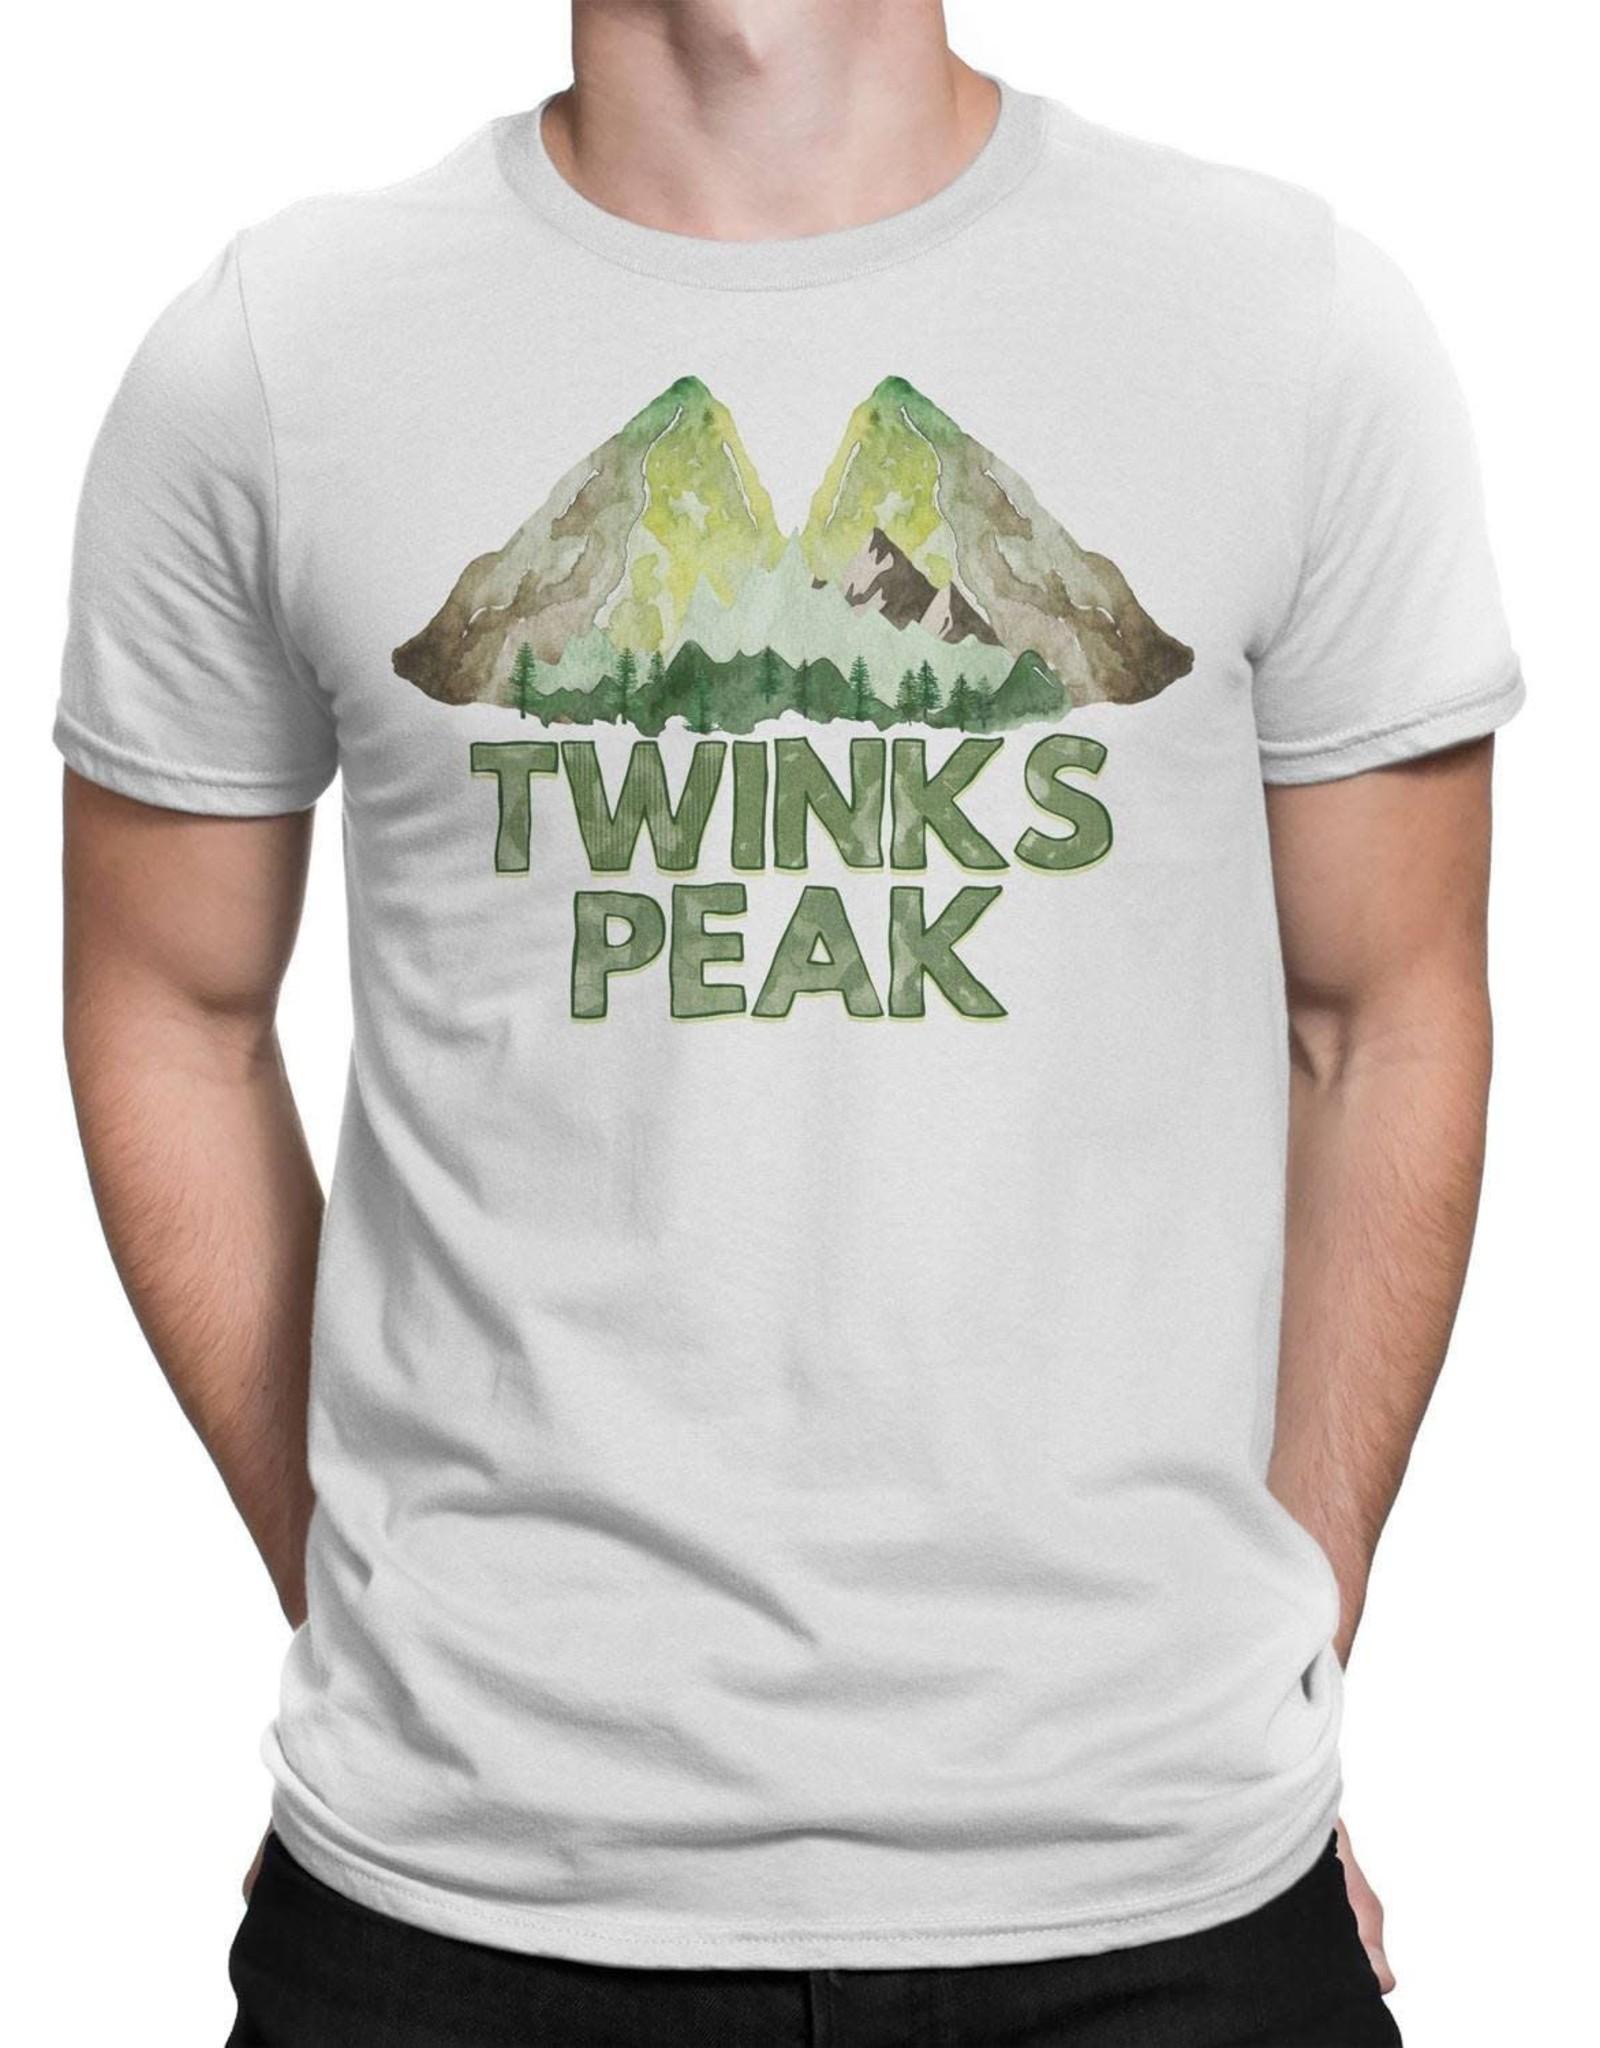 Huntees Twinks Peak T-shirt